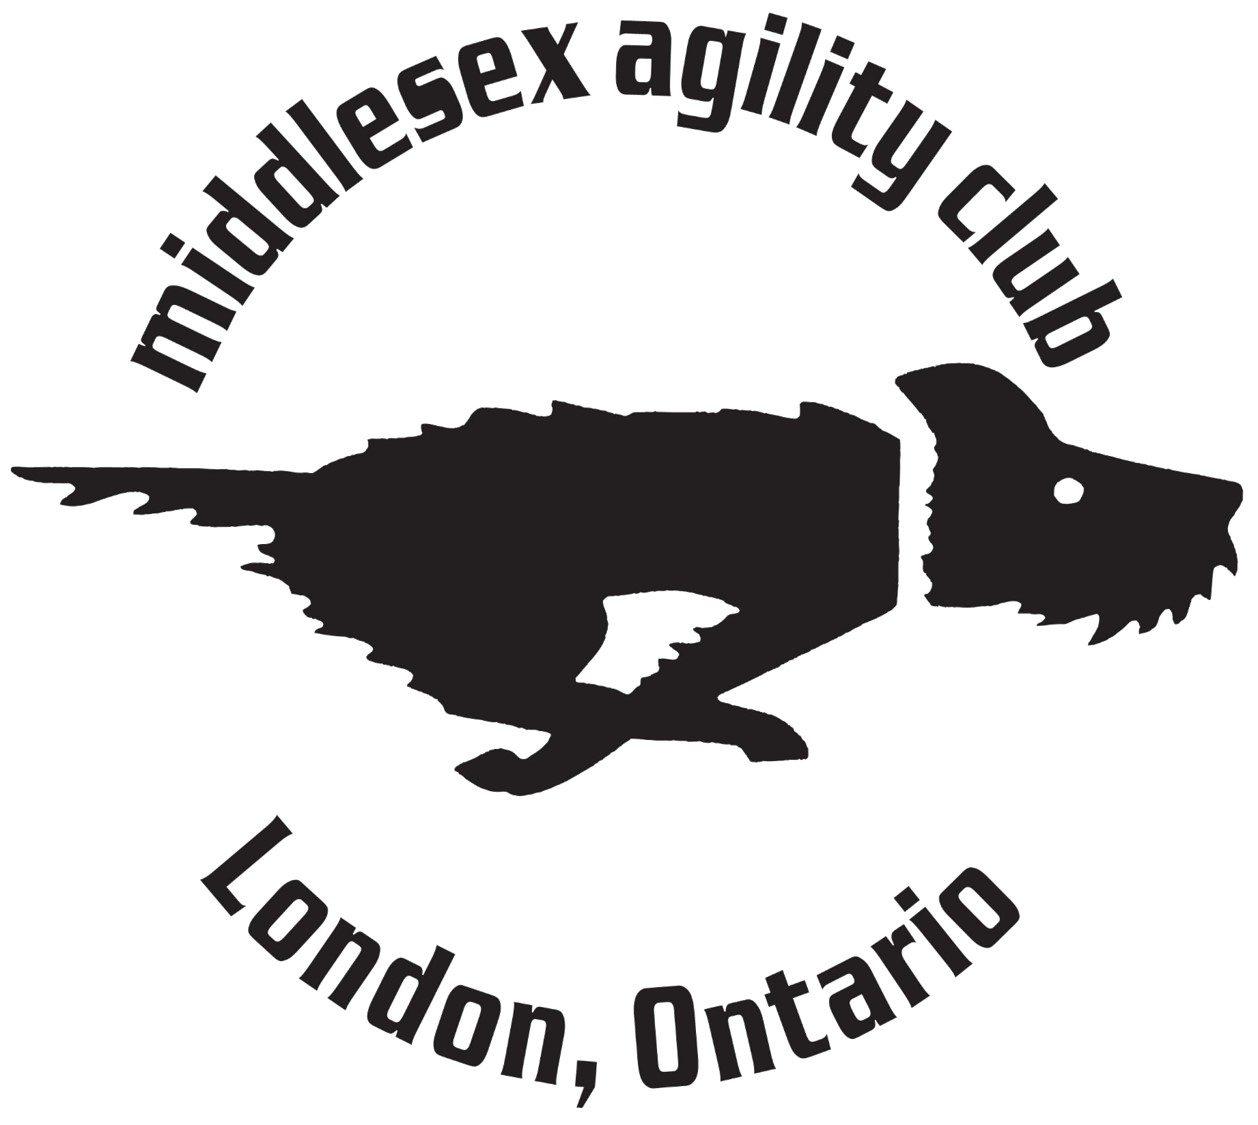 Middlesex Agility Club